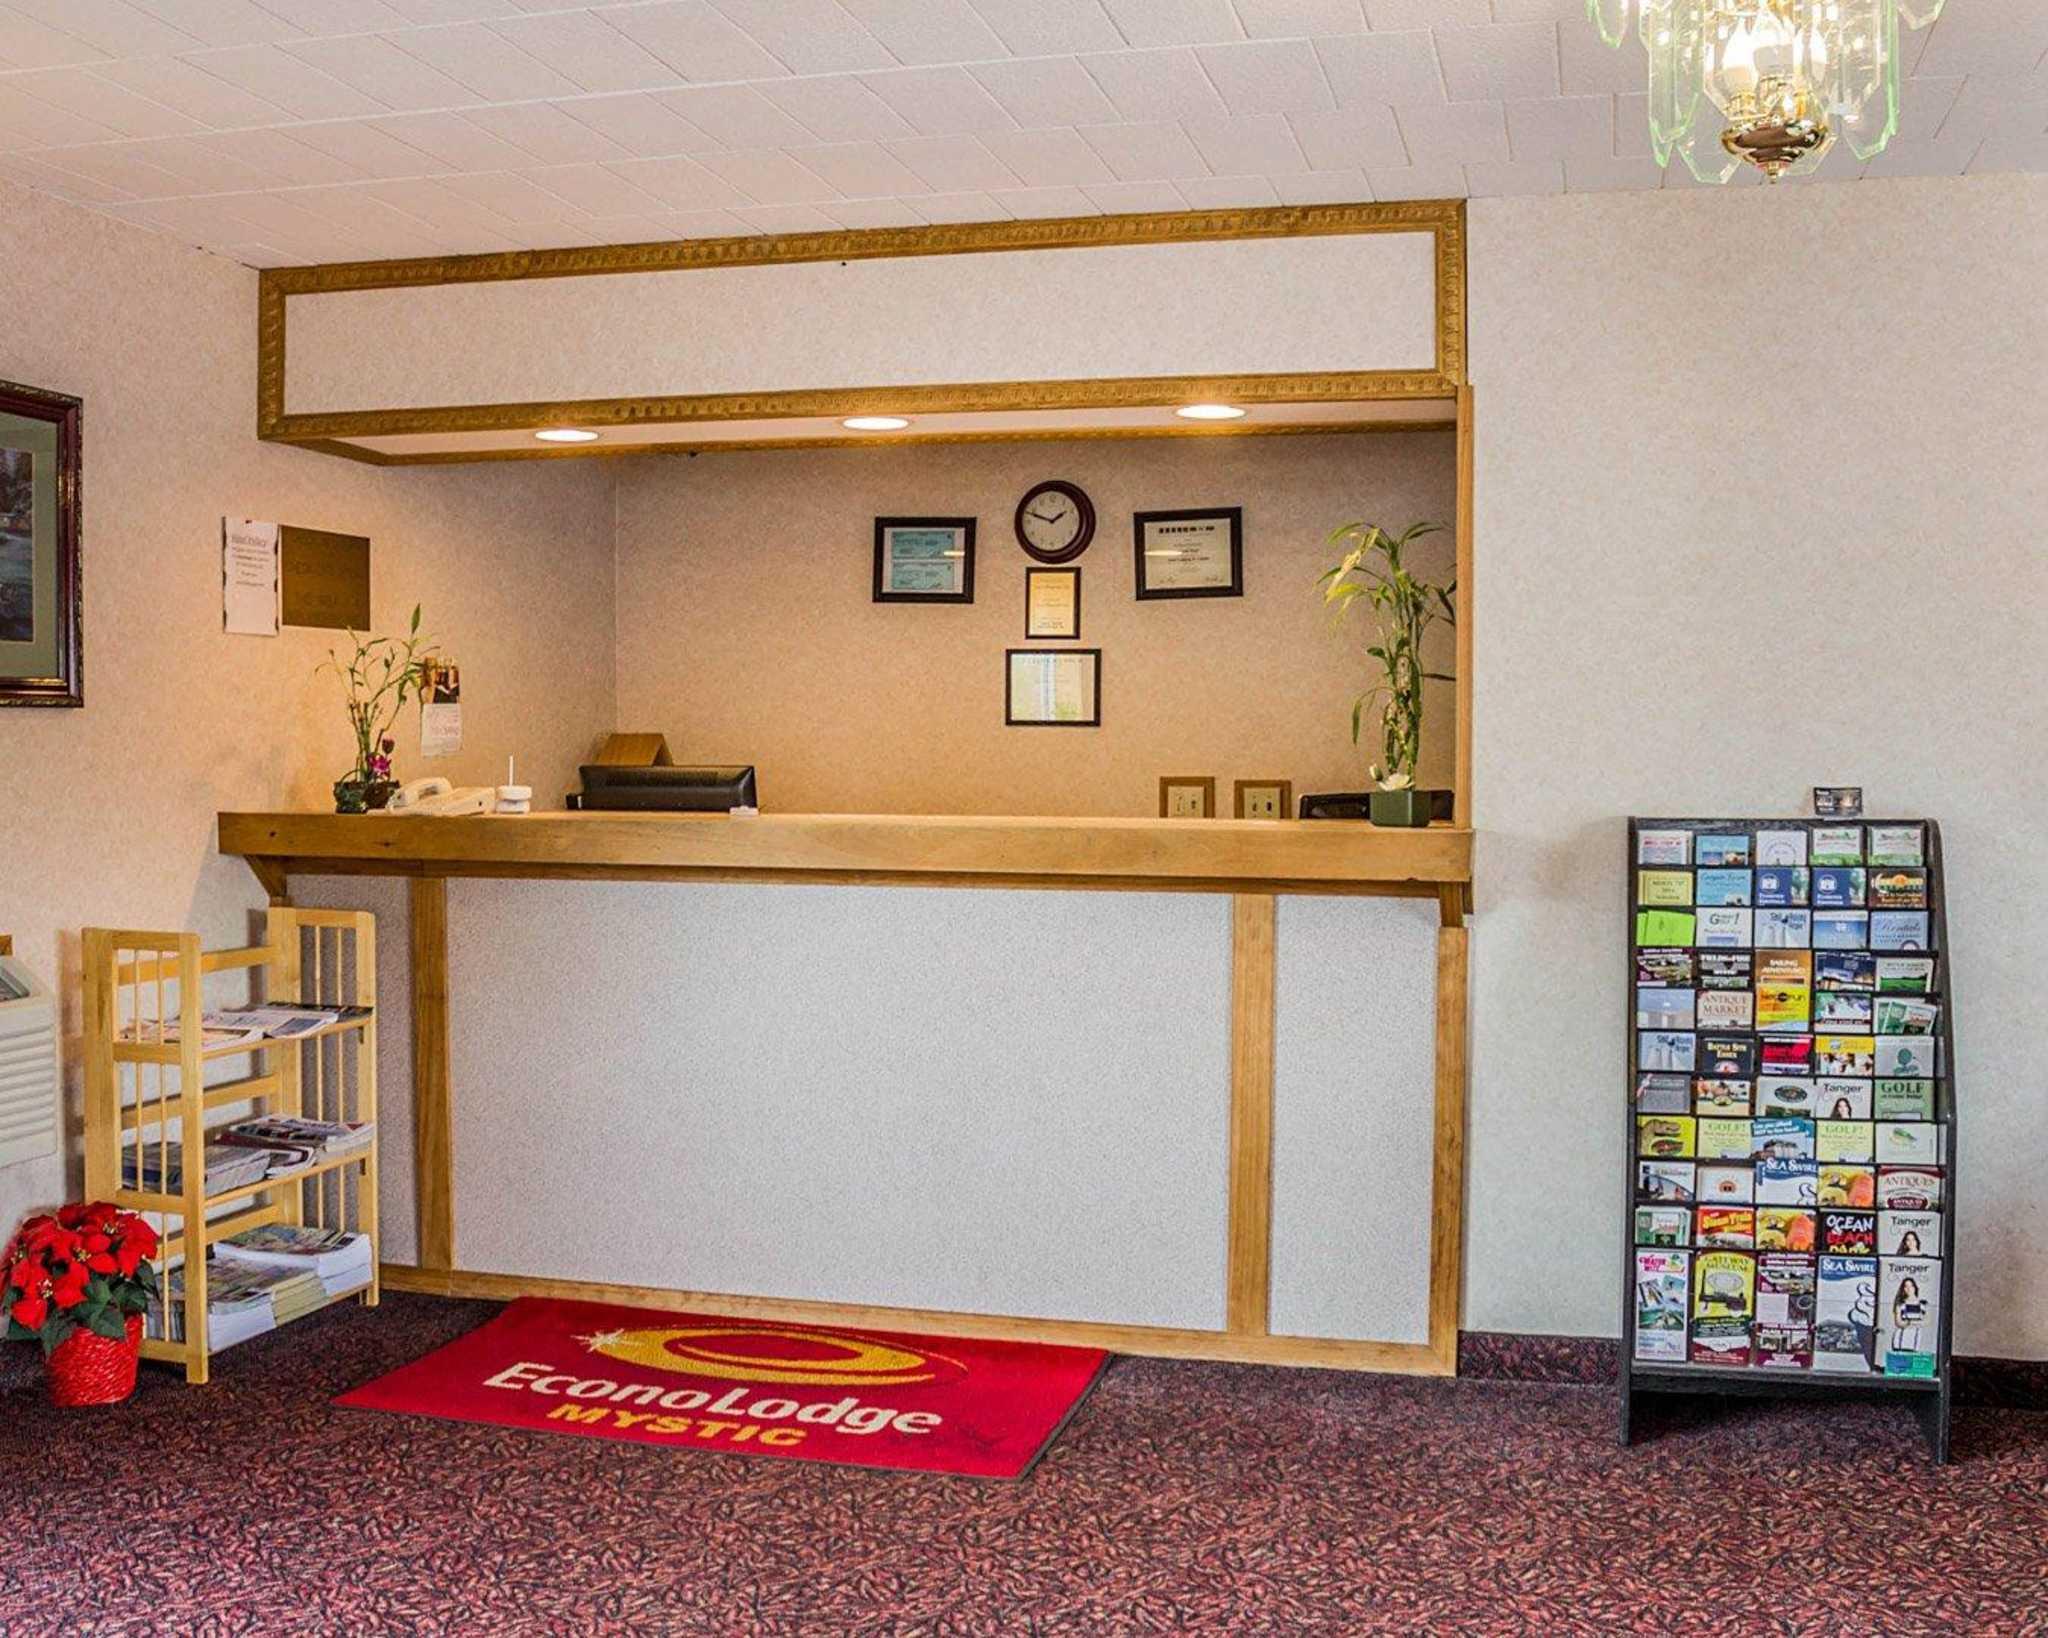 Econo Lodge Mystic - Groton image 11